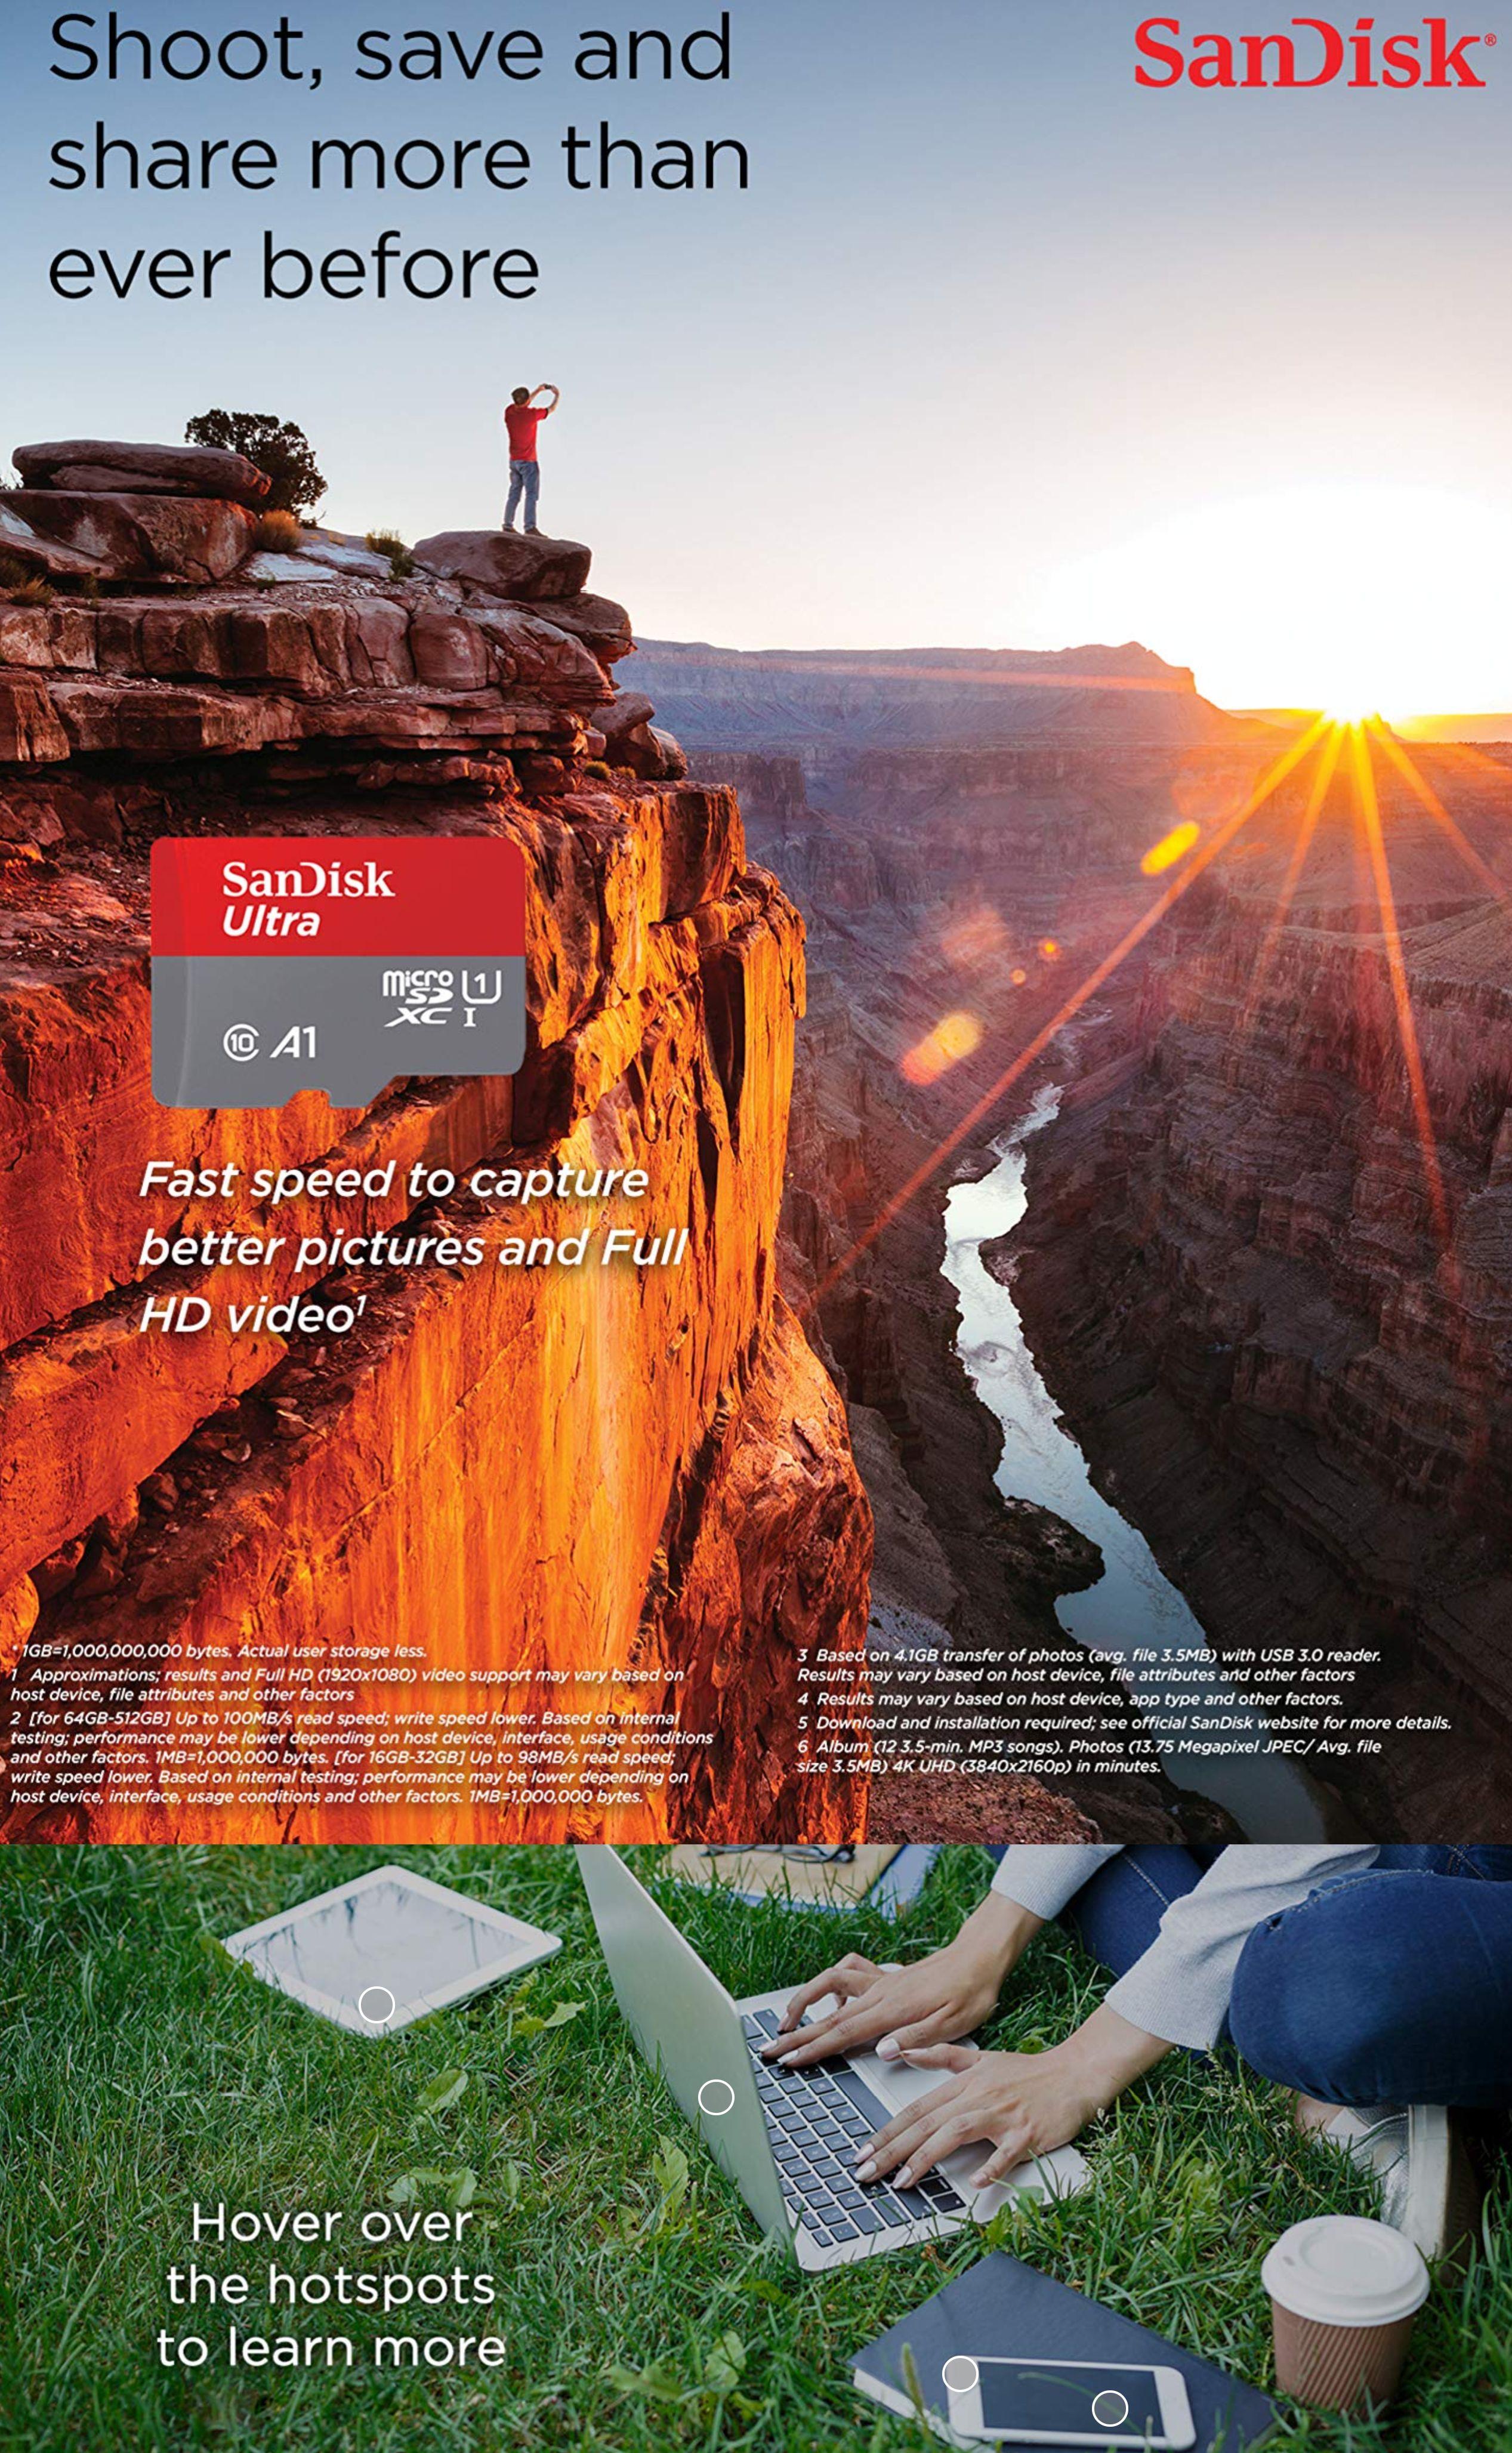 #1582 - 'Amazon_com_ SanDisk 128GB Ultra microSDXC UHS-I Memory Card with Adapter - C10, U1, Full HD, A1, Micro SD Card - SDSQUAR-1_' - www_amazon_com.jpg